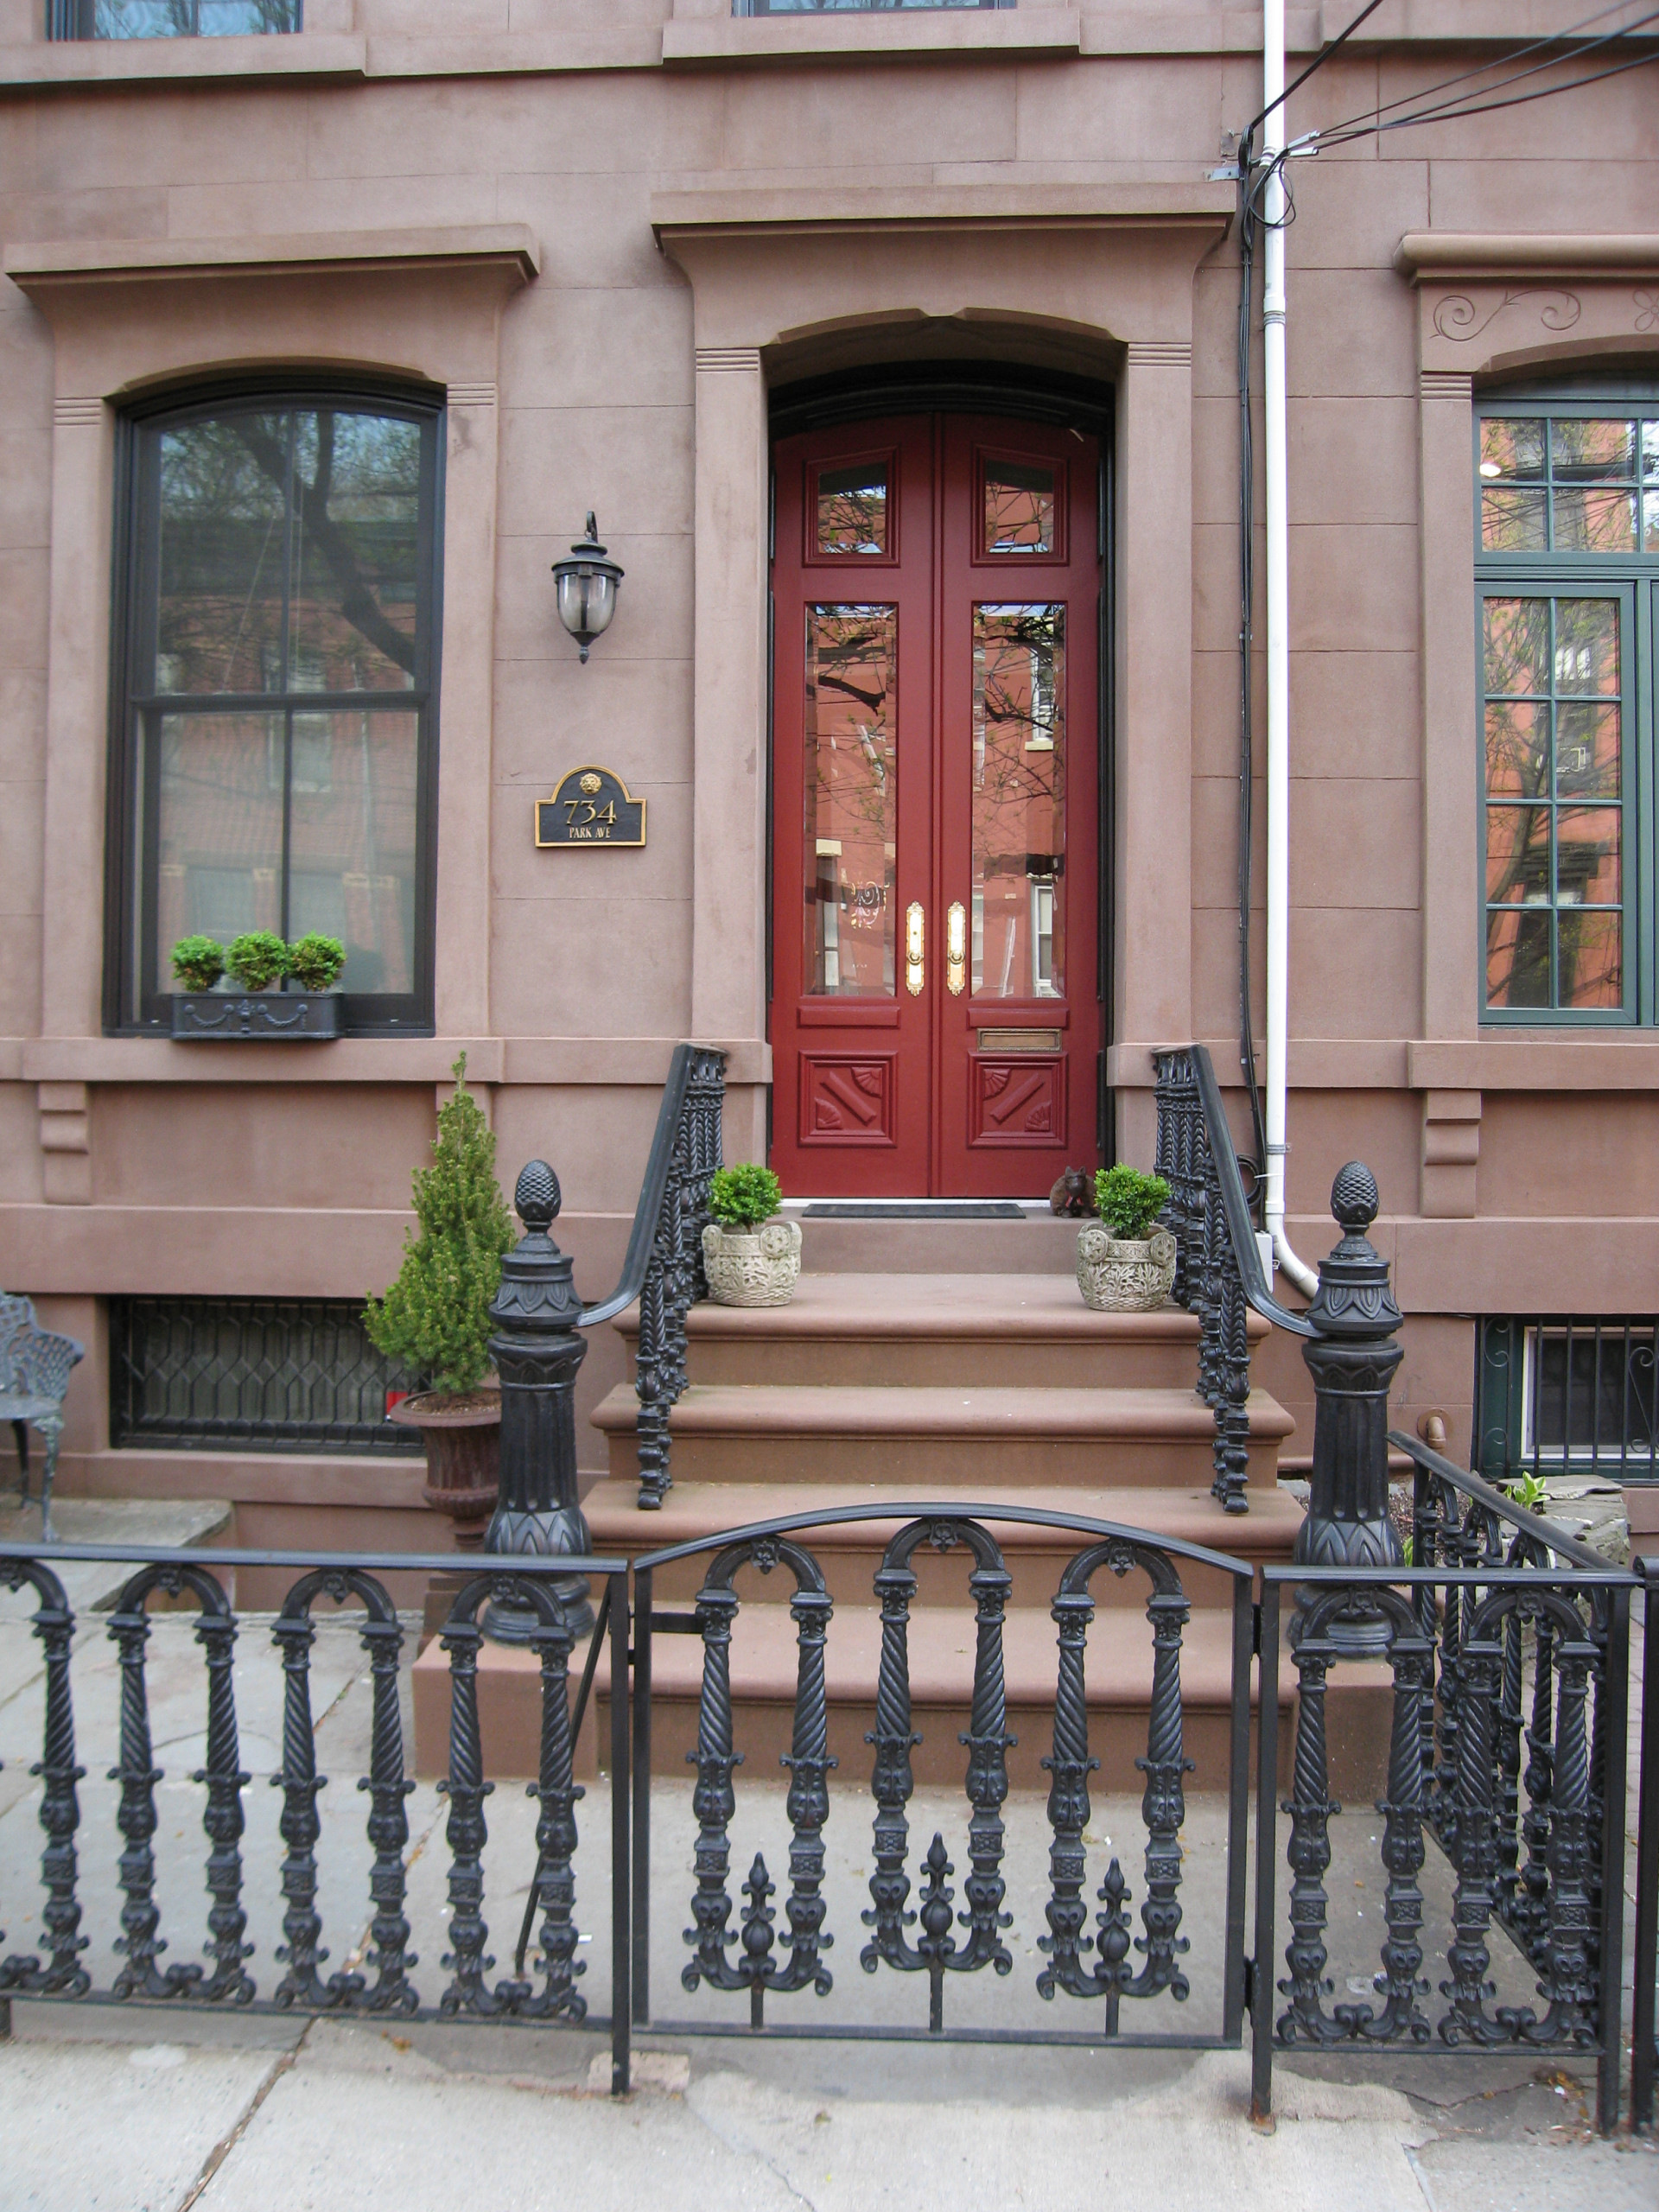 Brownstone Gut Renovation - Restoration -  7th Park Avenue - Hoboken, NJ